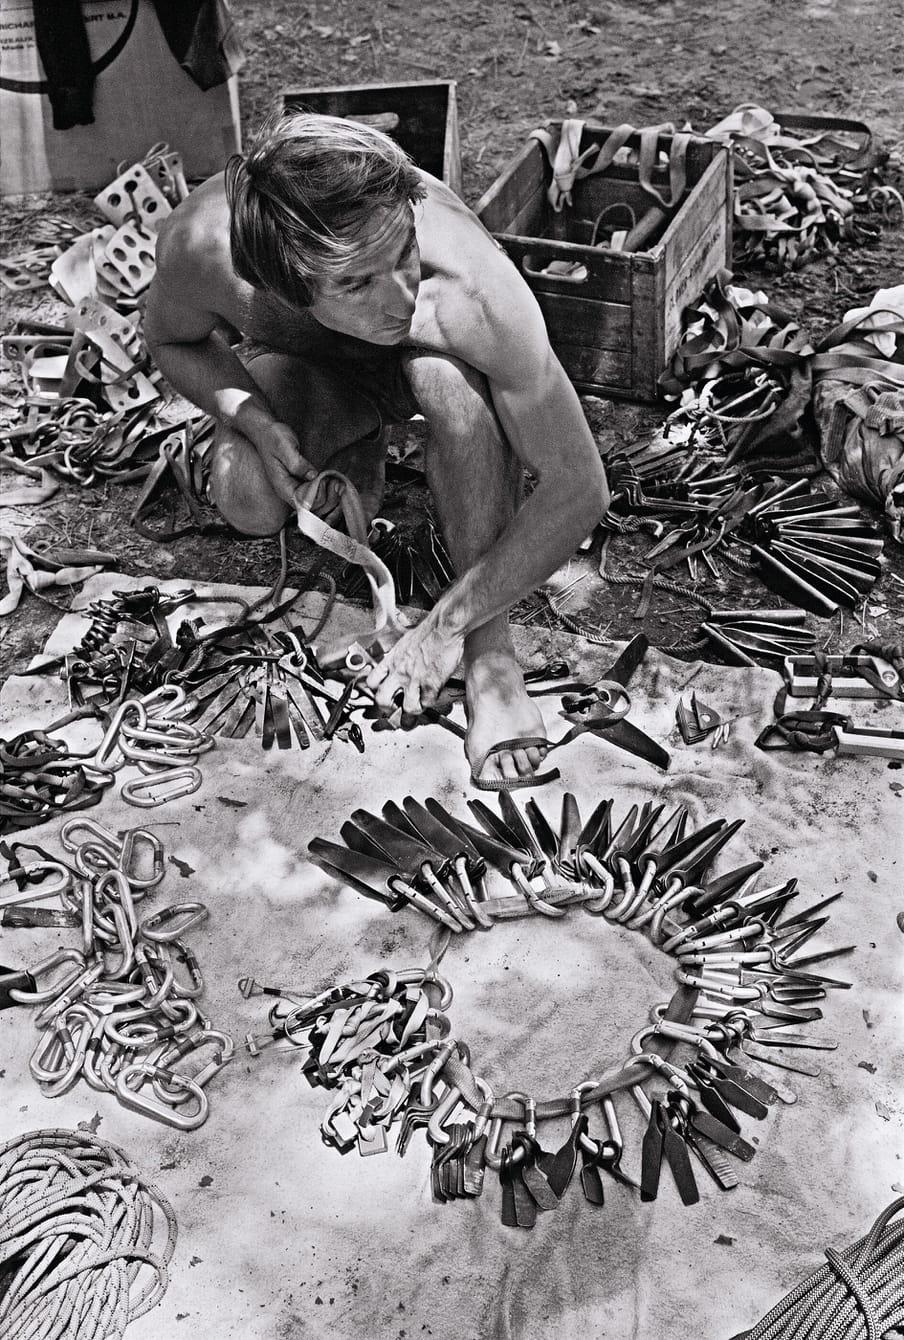 Oprichter Yvon Chouinard tussen zijn verzameling pitons, 1969. Beeld: Glen Denny